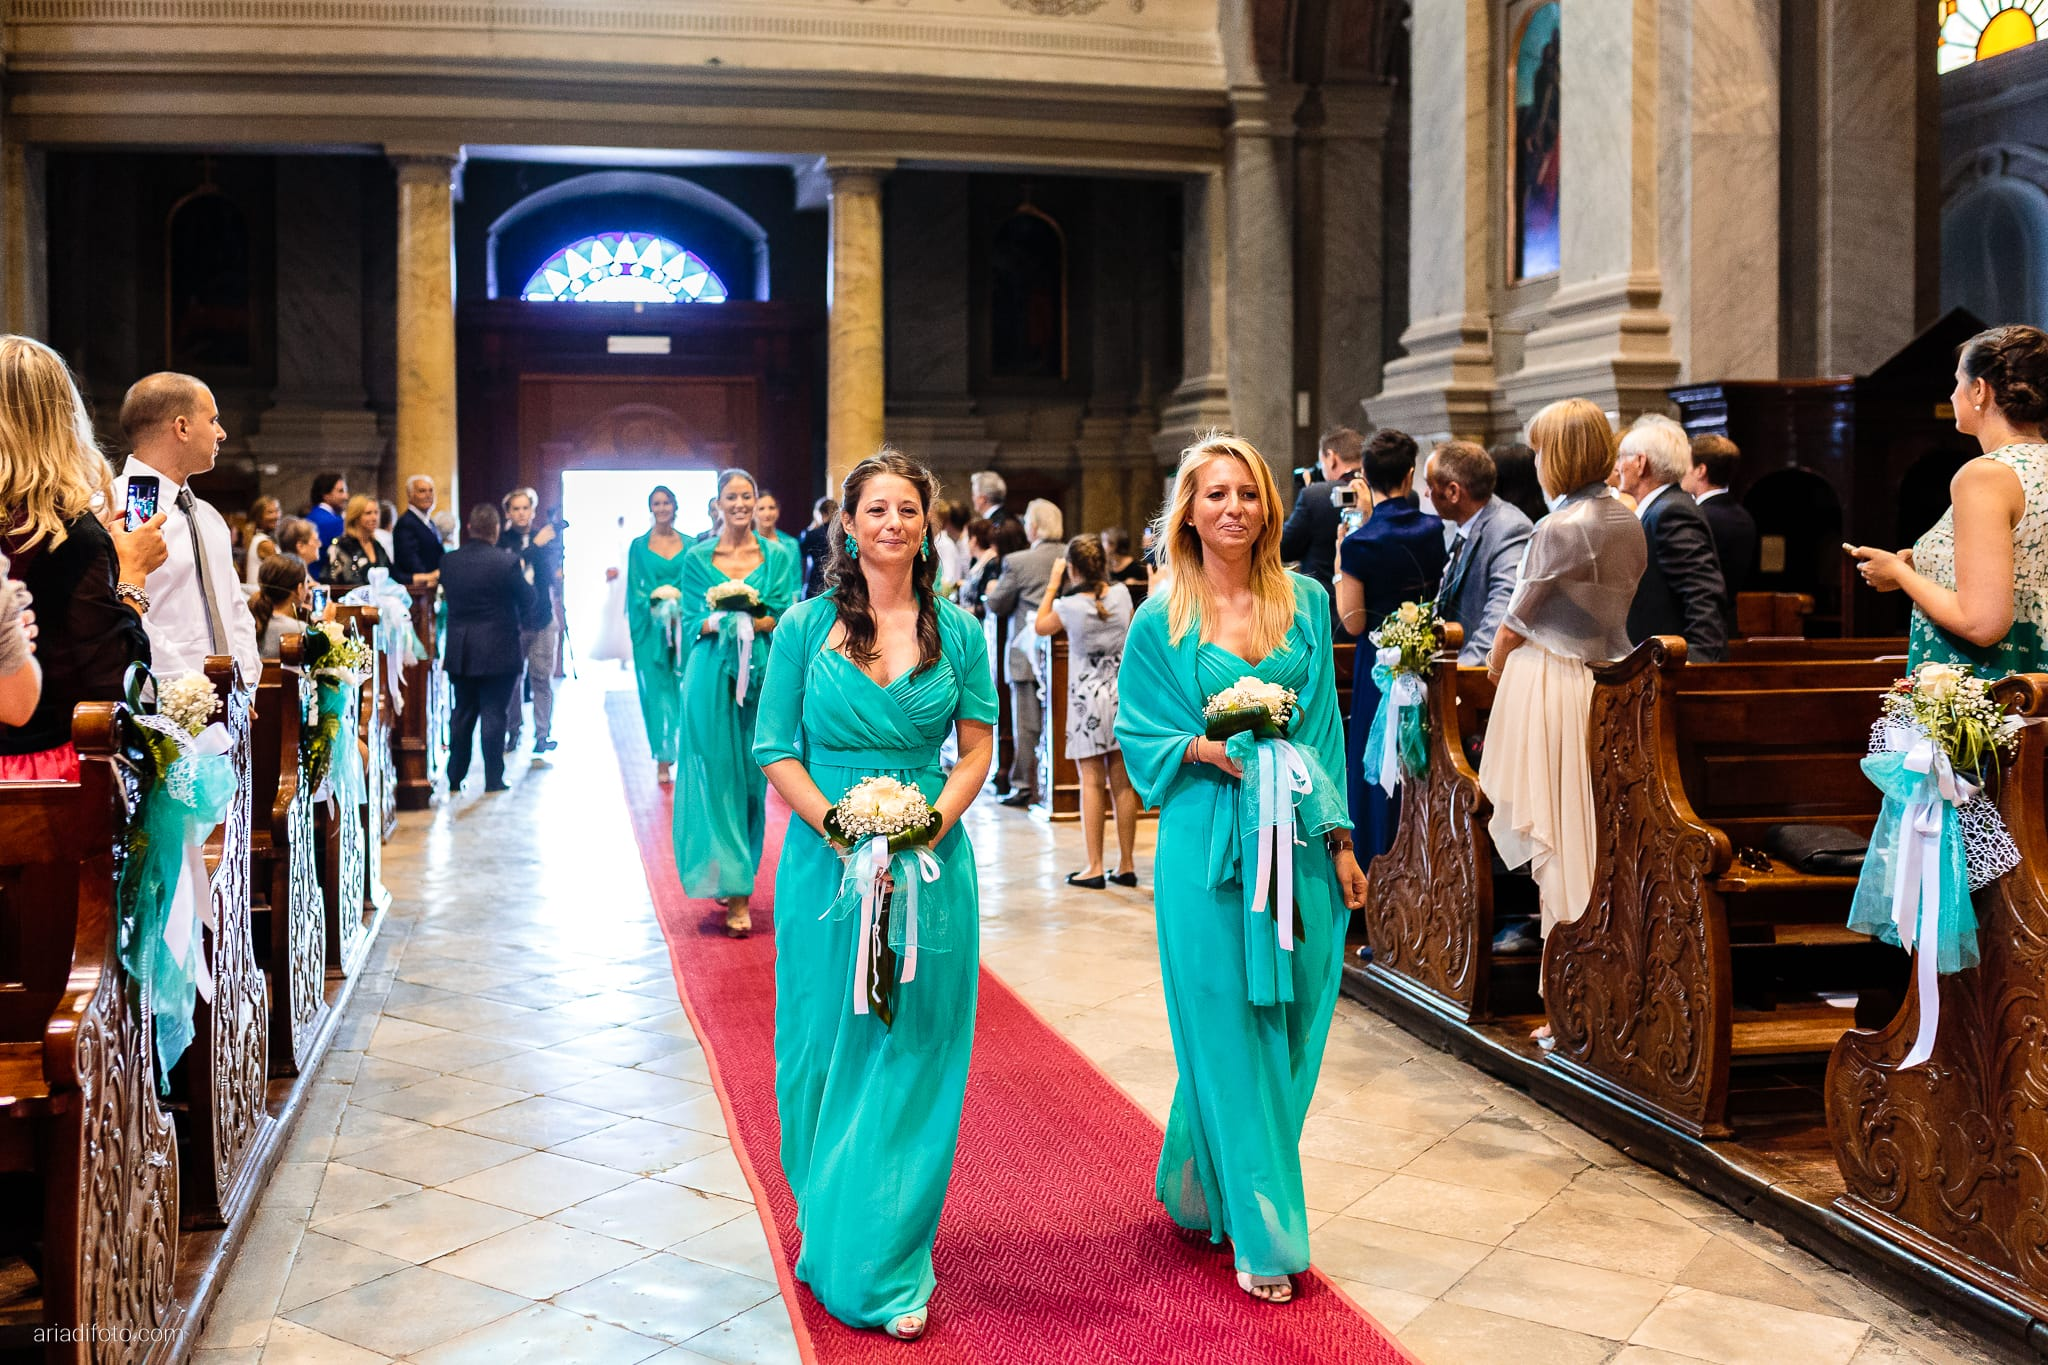 Martina Maurizio matrimonio Trieste Castello Spessa Gorizia cerimonia Santa Maria Maggiore ingresso sposa damigelle